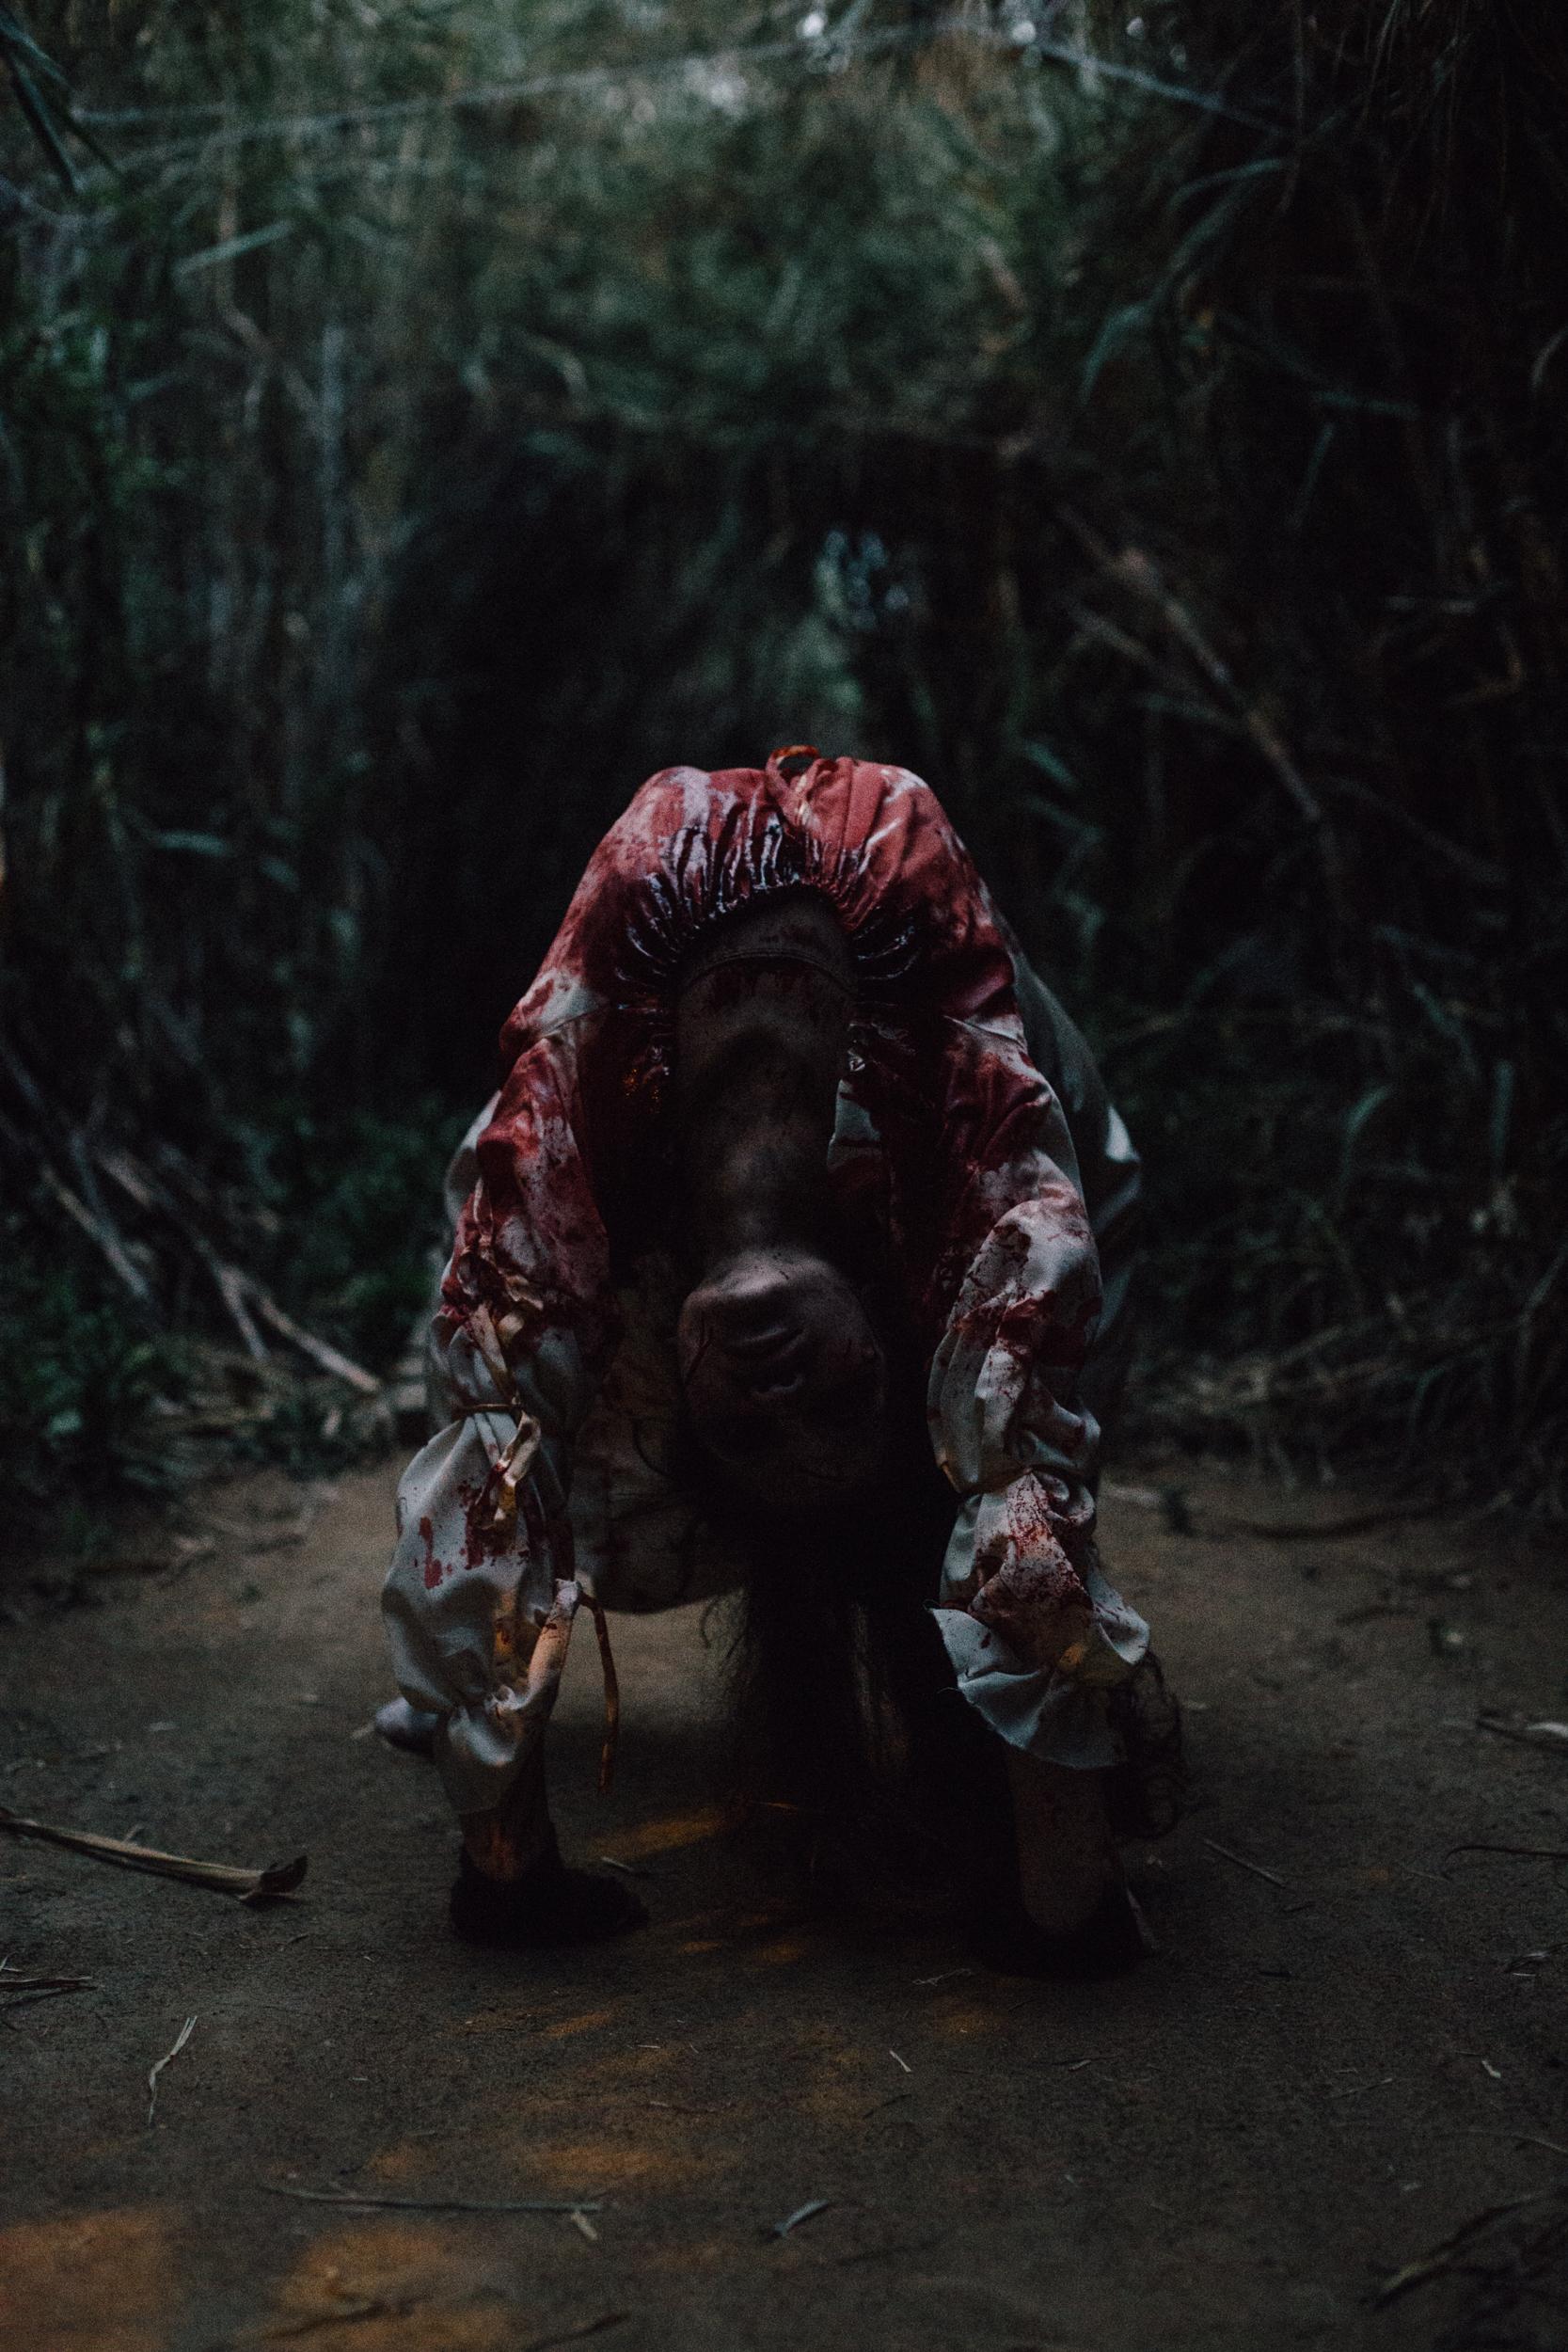 DStv Halloween Night Run brings Joburg the scariest night!